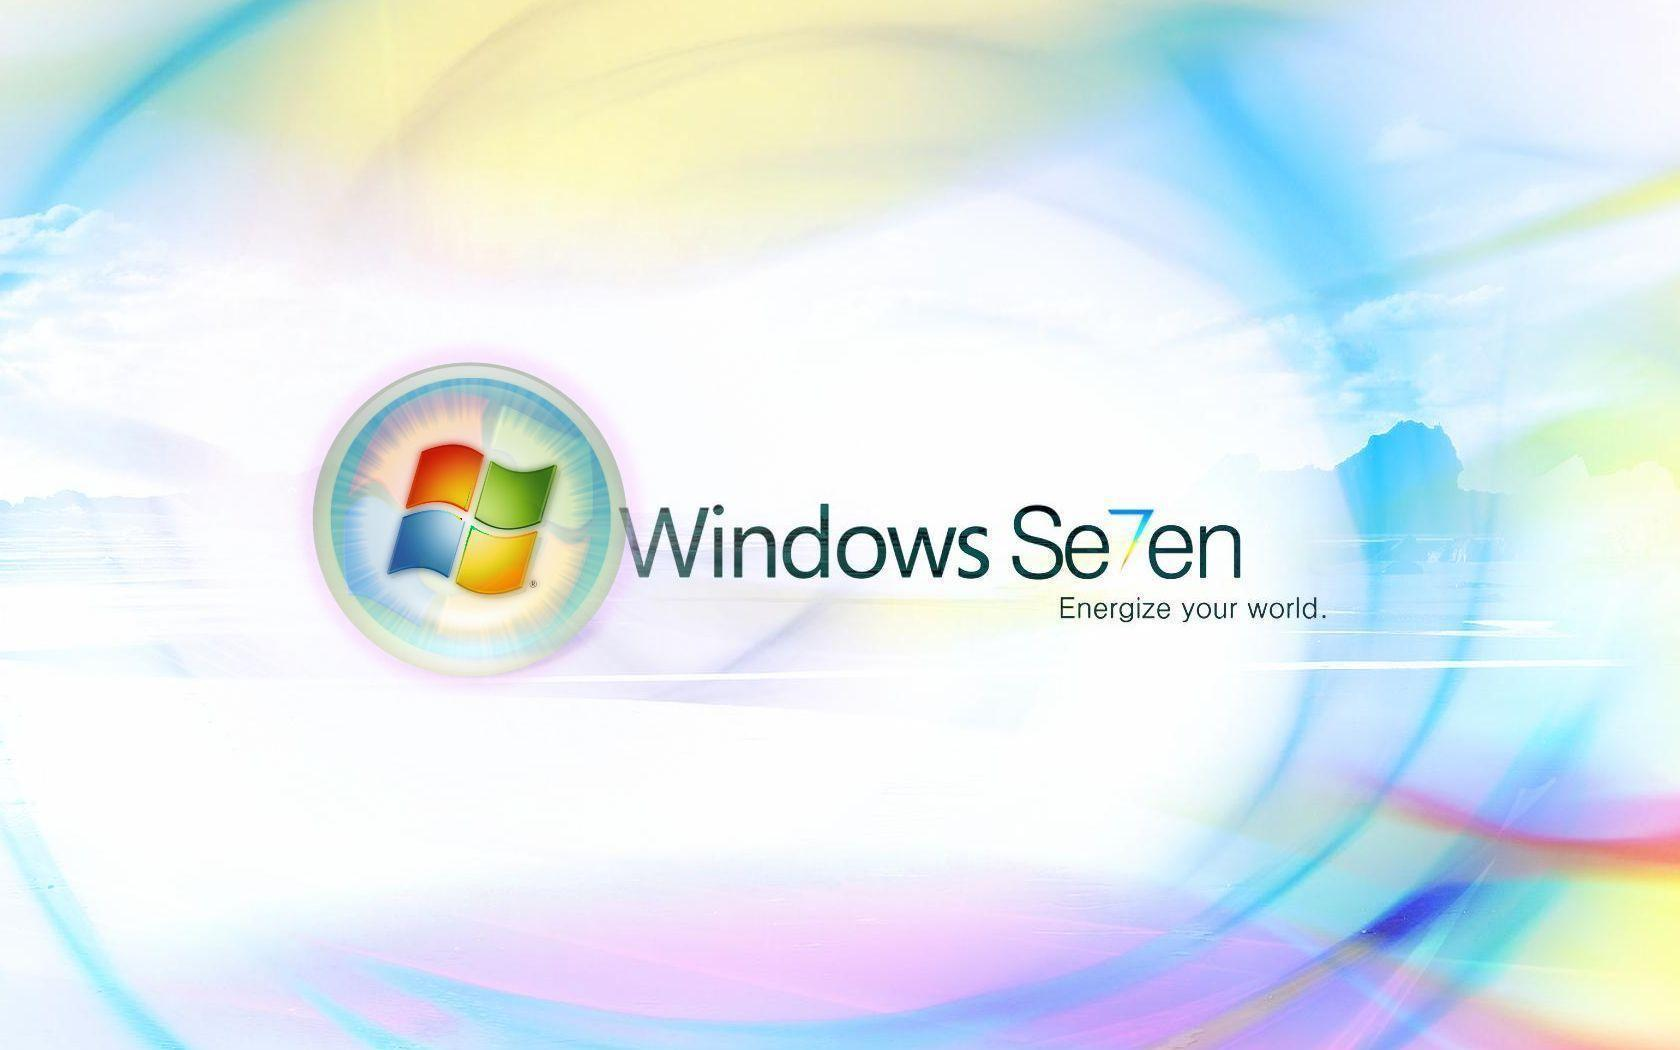 Windows 7 Ultimate Wallpapers - Wallpaper Cave